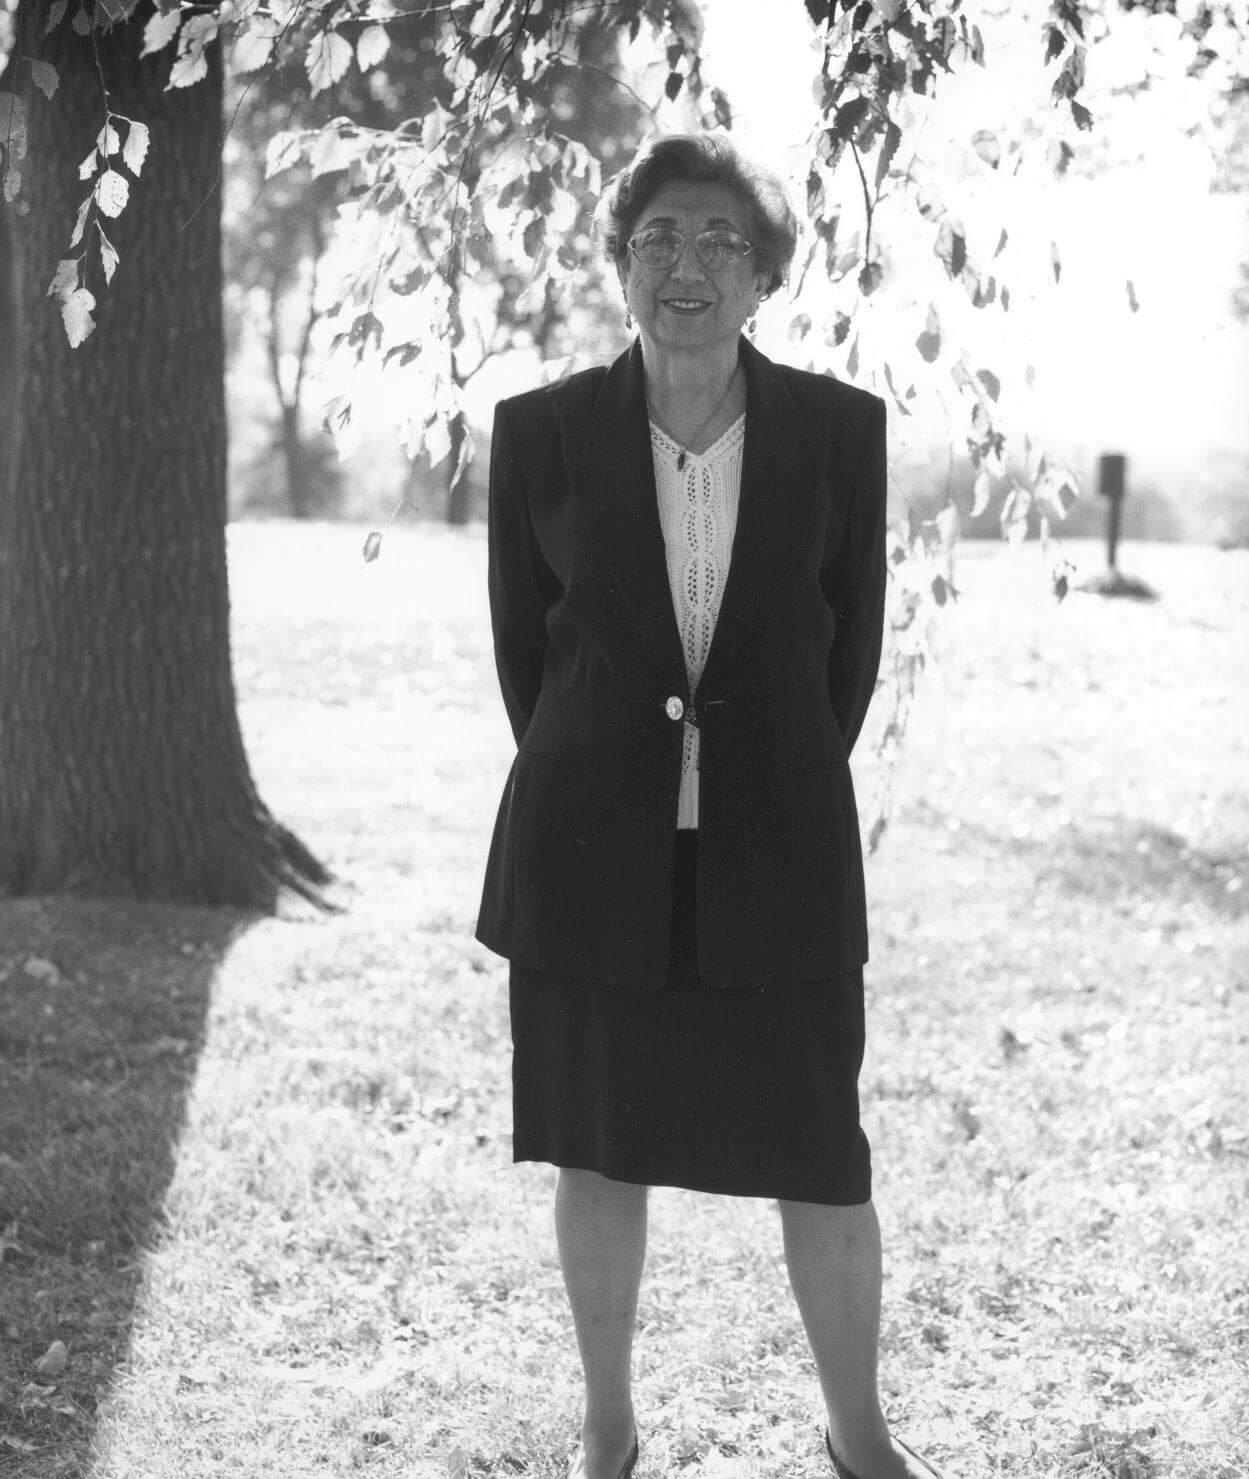 Olga Rothstein